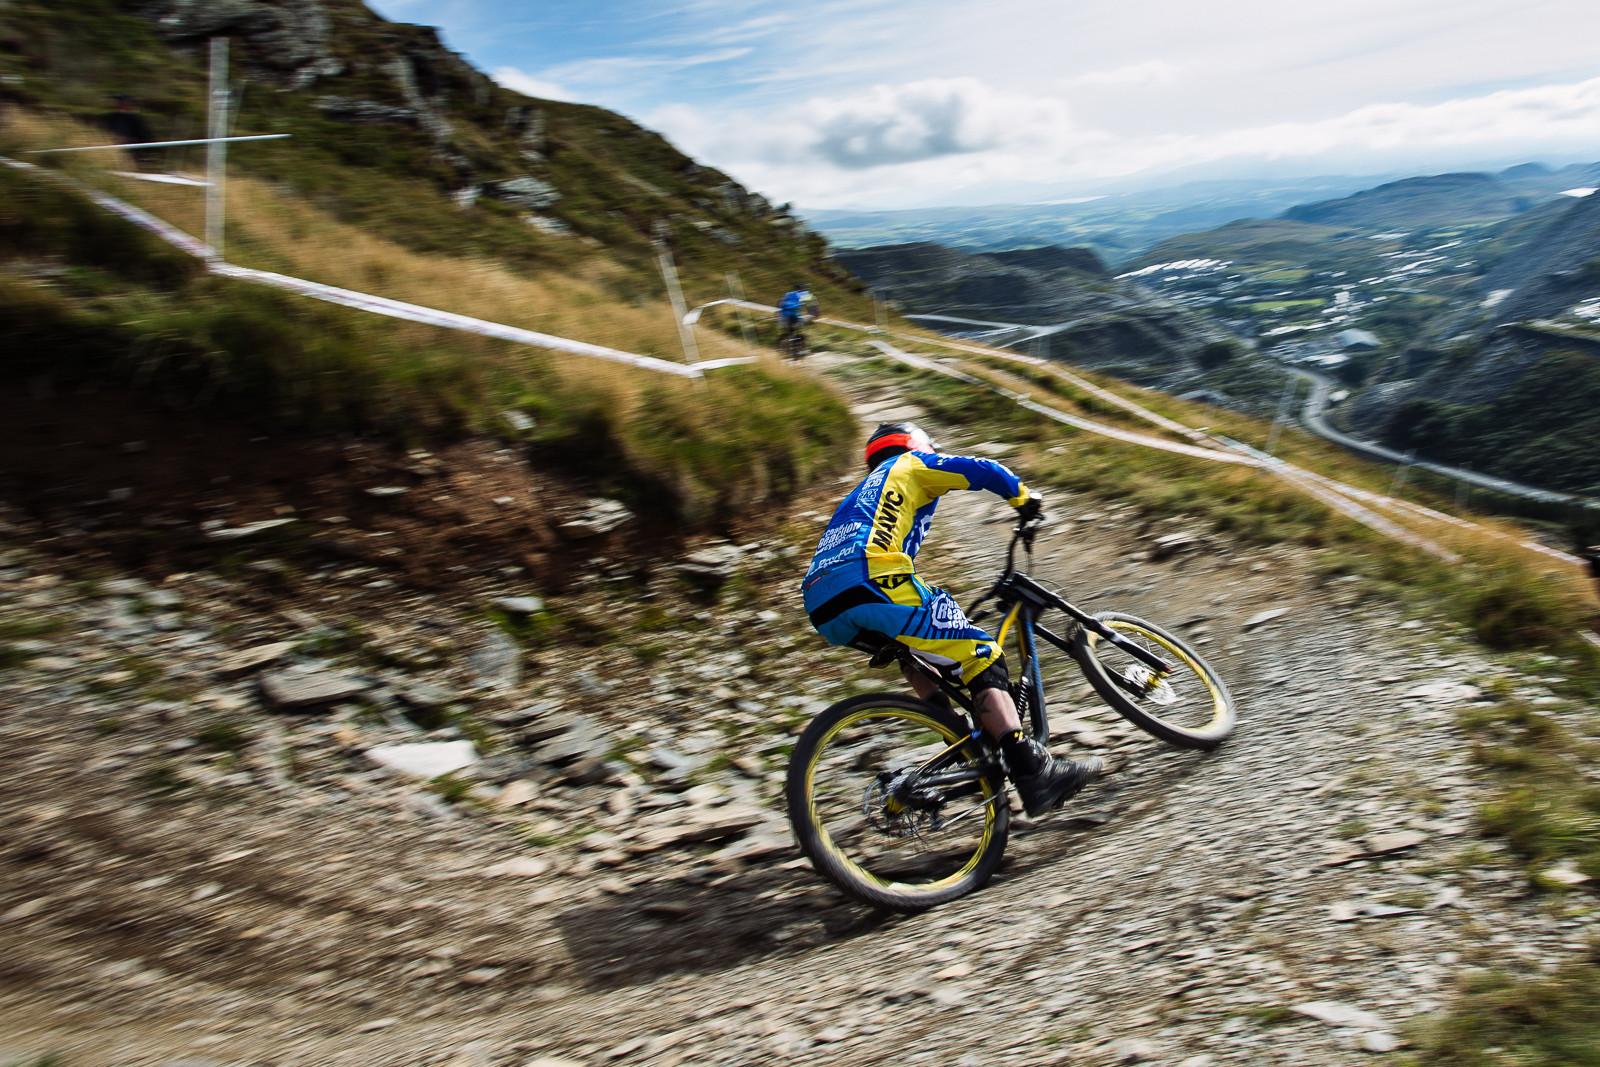 Nigel Page, 2015 British Downhill Series Finals, Antur Stiniog - 2015 British Downhill Series Finals - Mountain Biking Pictures - Vital MTB